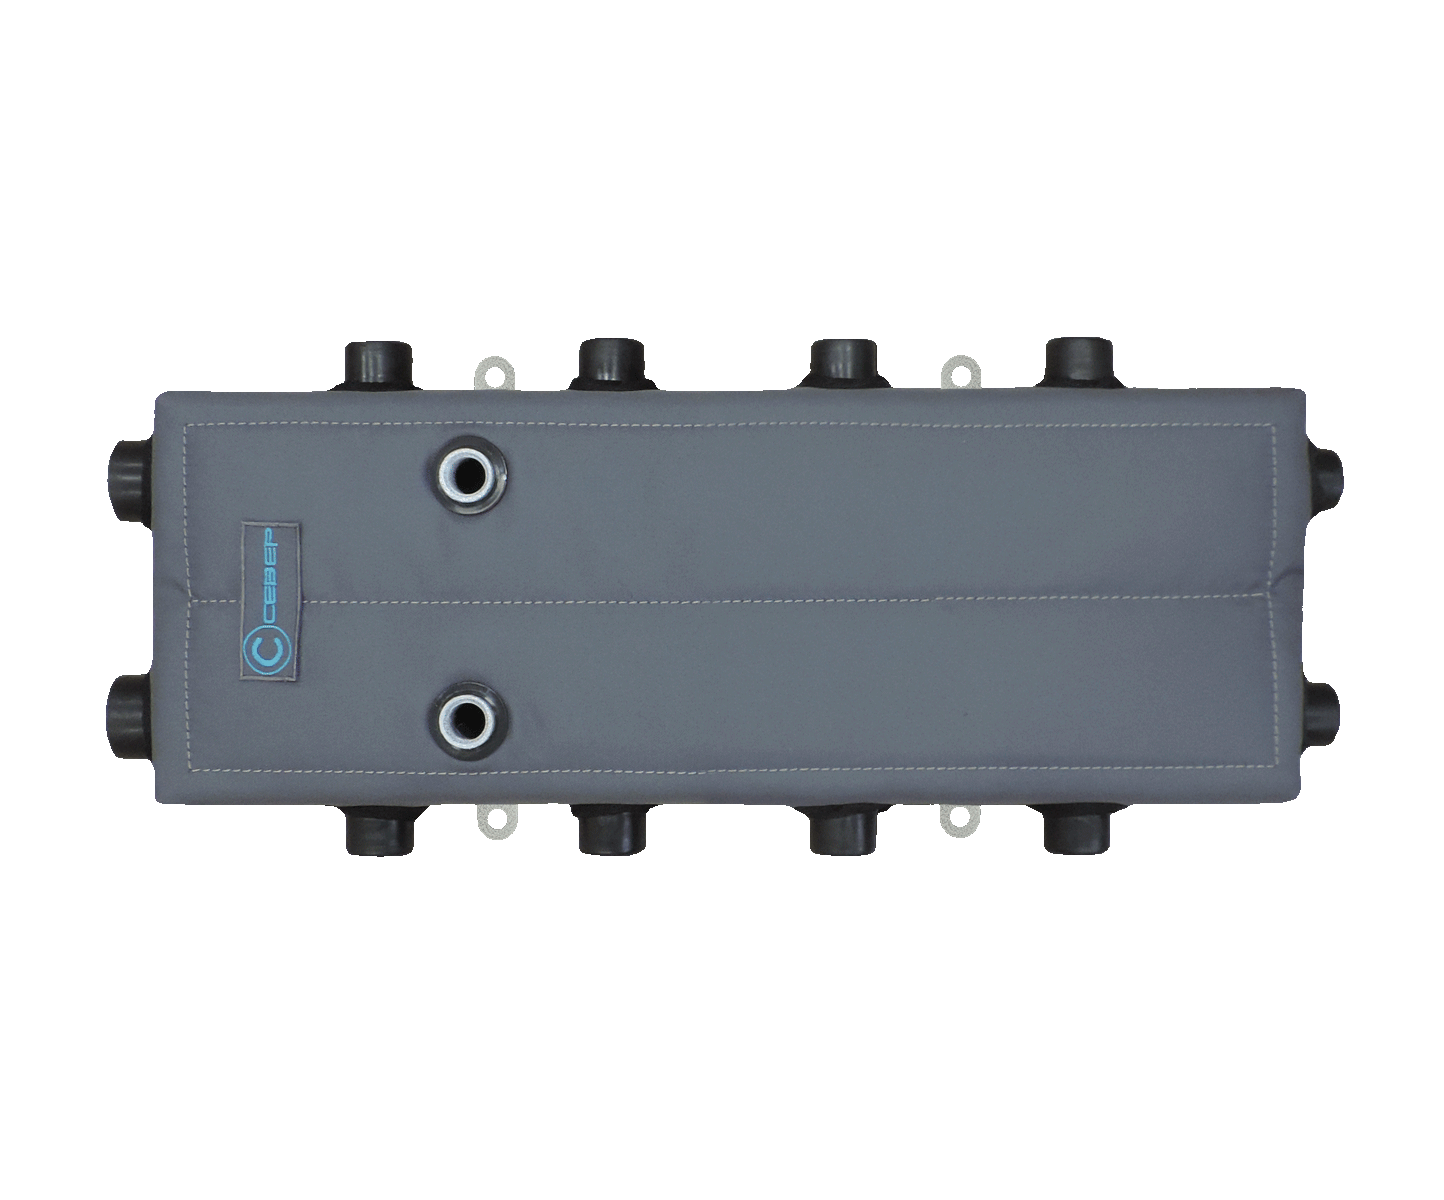 Теплоизоляция, теплоизоляционный чехол для гидрообвязки Север КМ5